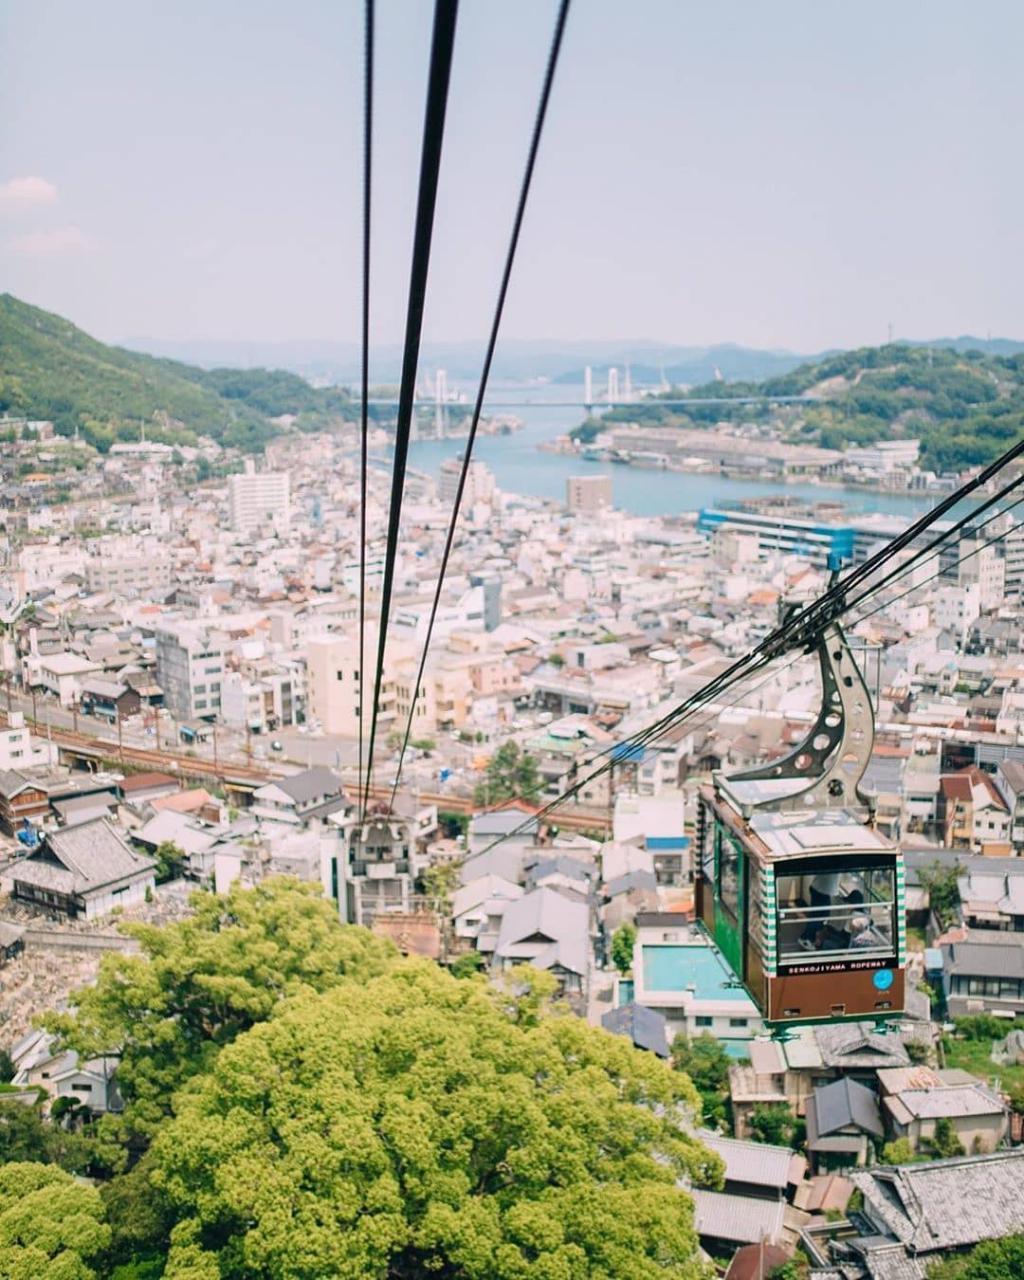 Tips Memilih Paket Sewa Wifi Jepang Buat Kamu Yang Mau Liburan Ke Jepang!